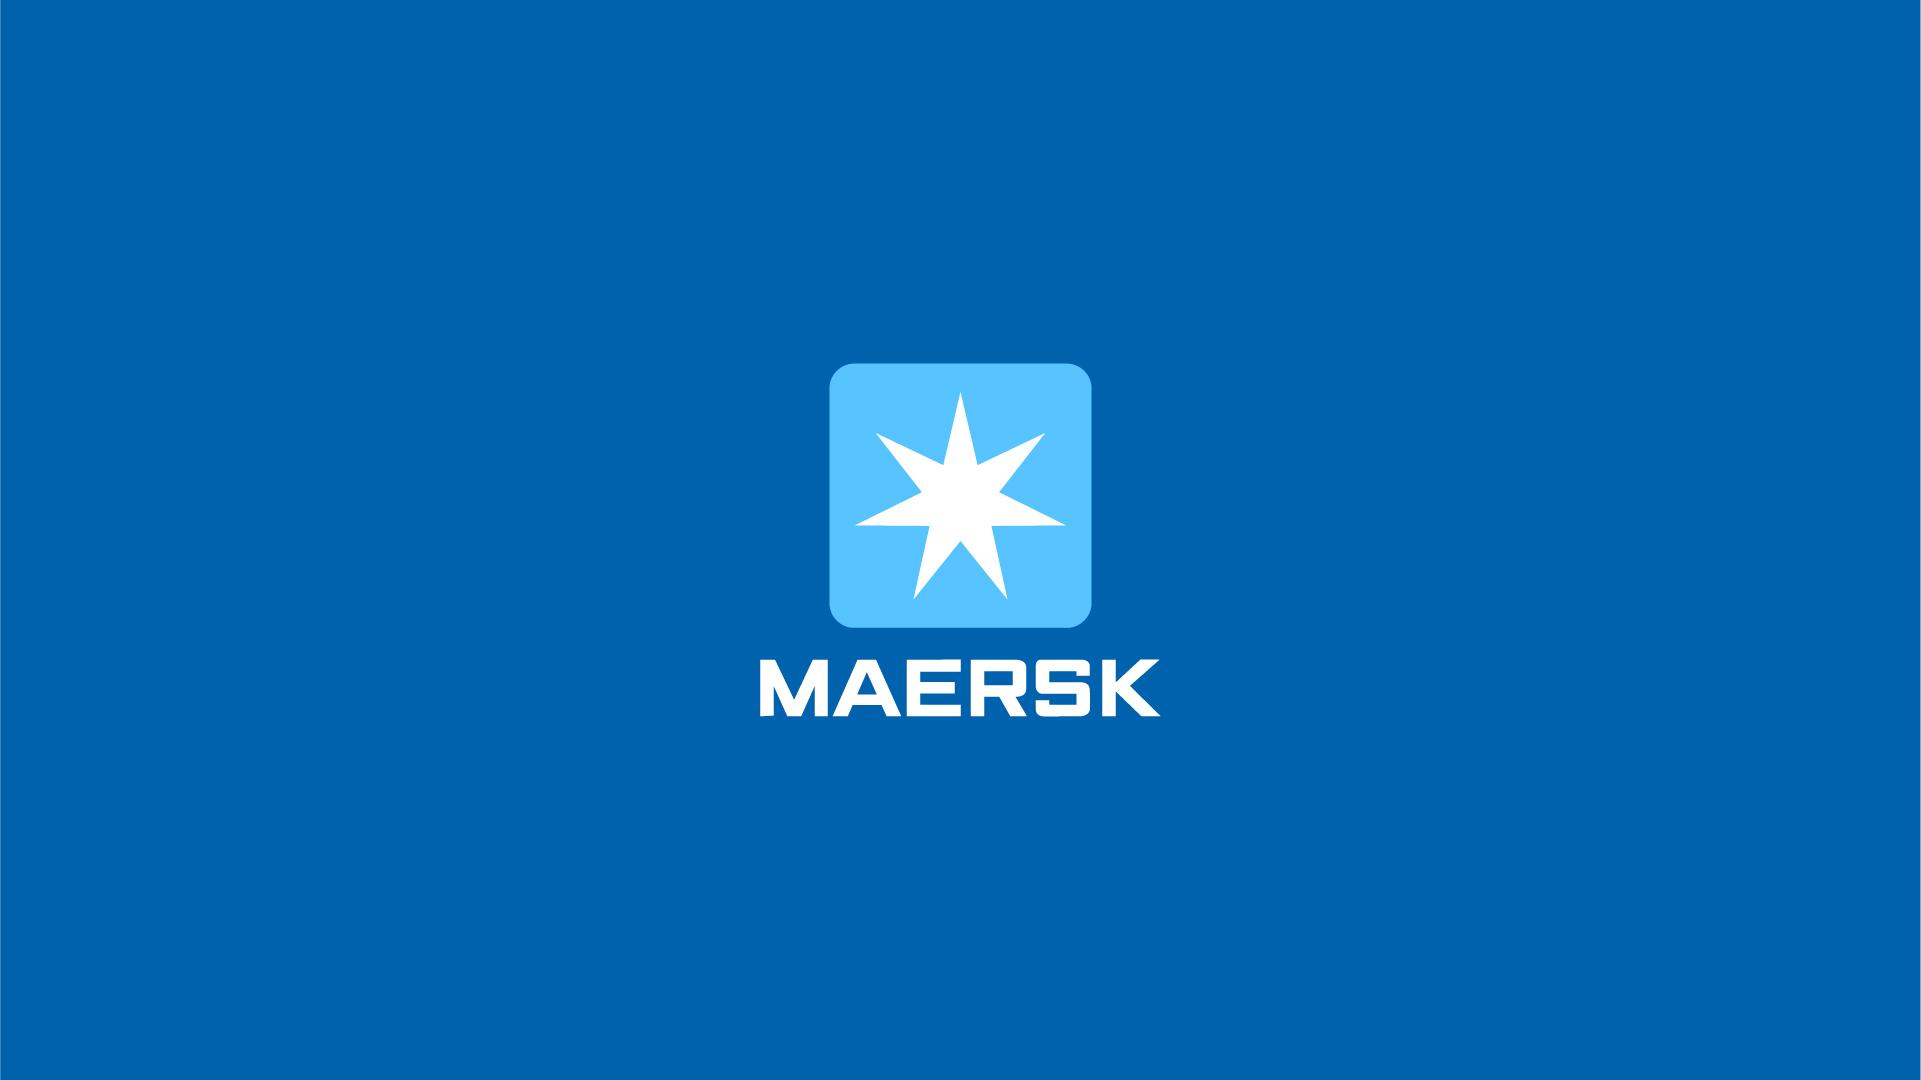 TeamMSK_01-Problem_ copy1920x1080_RGB.jpg